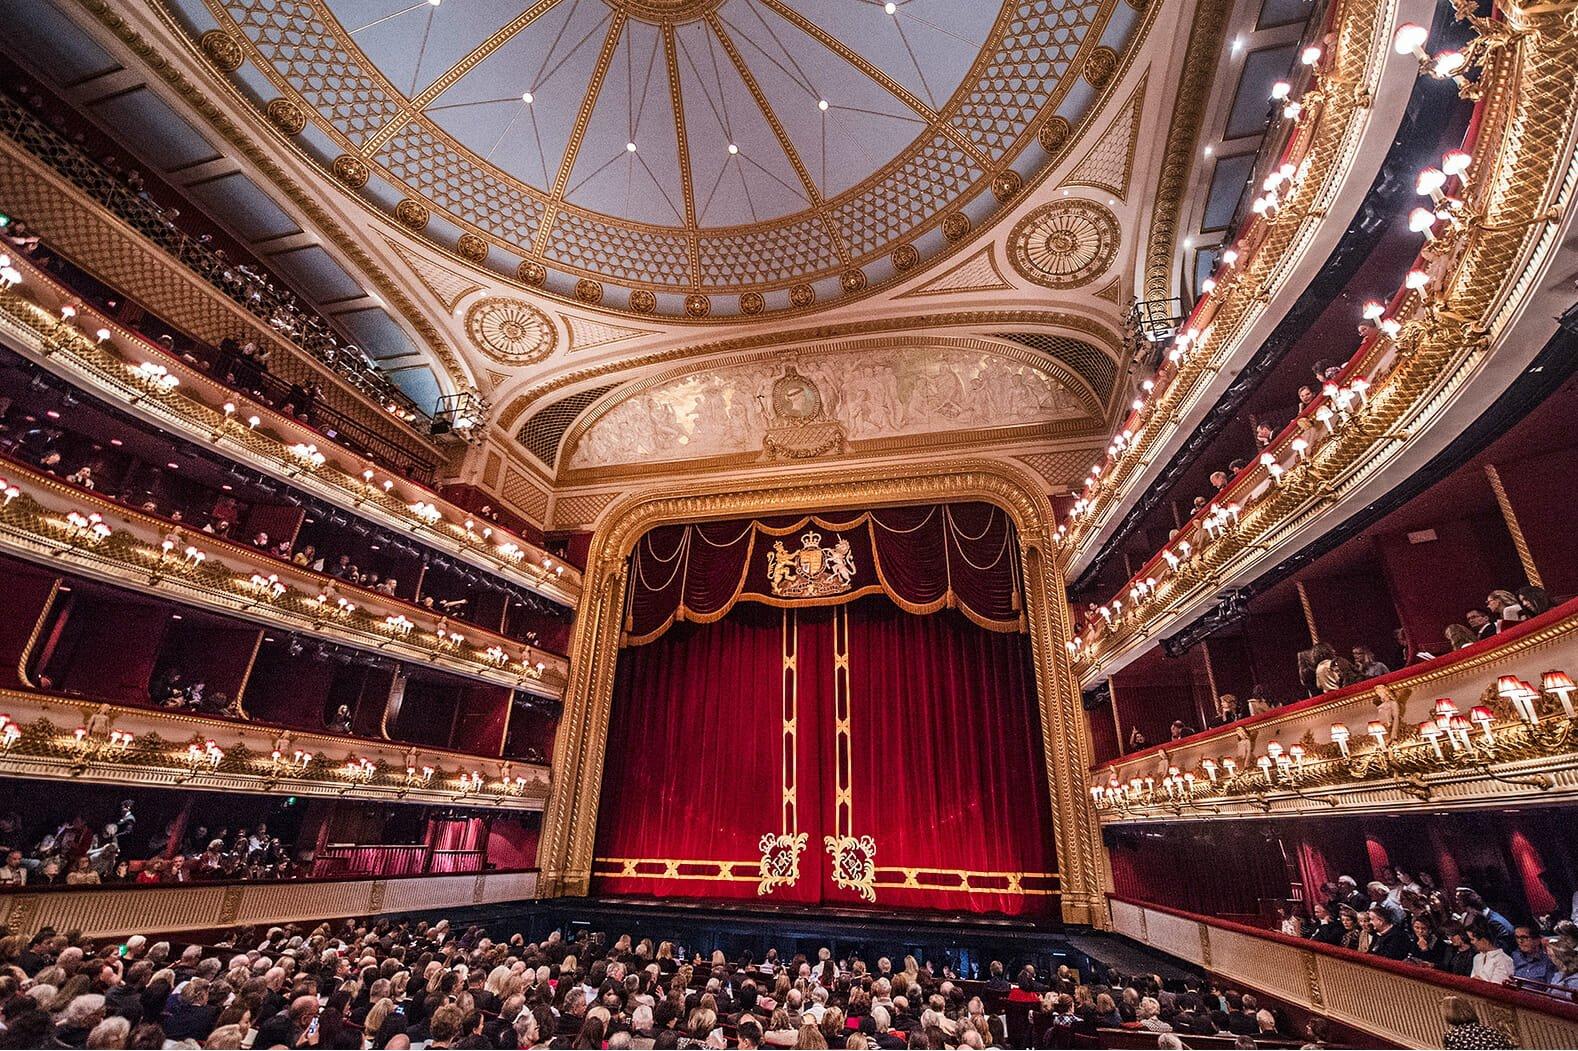 Royal Opera House ballet London